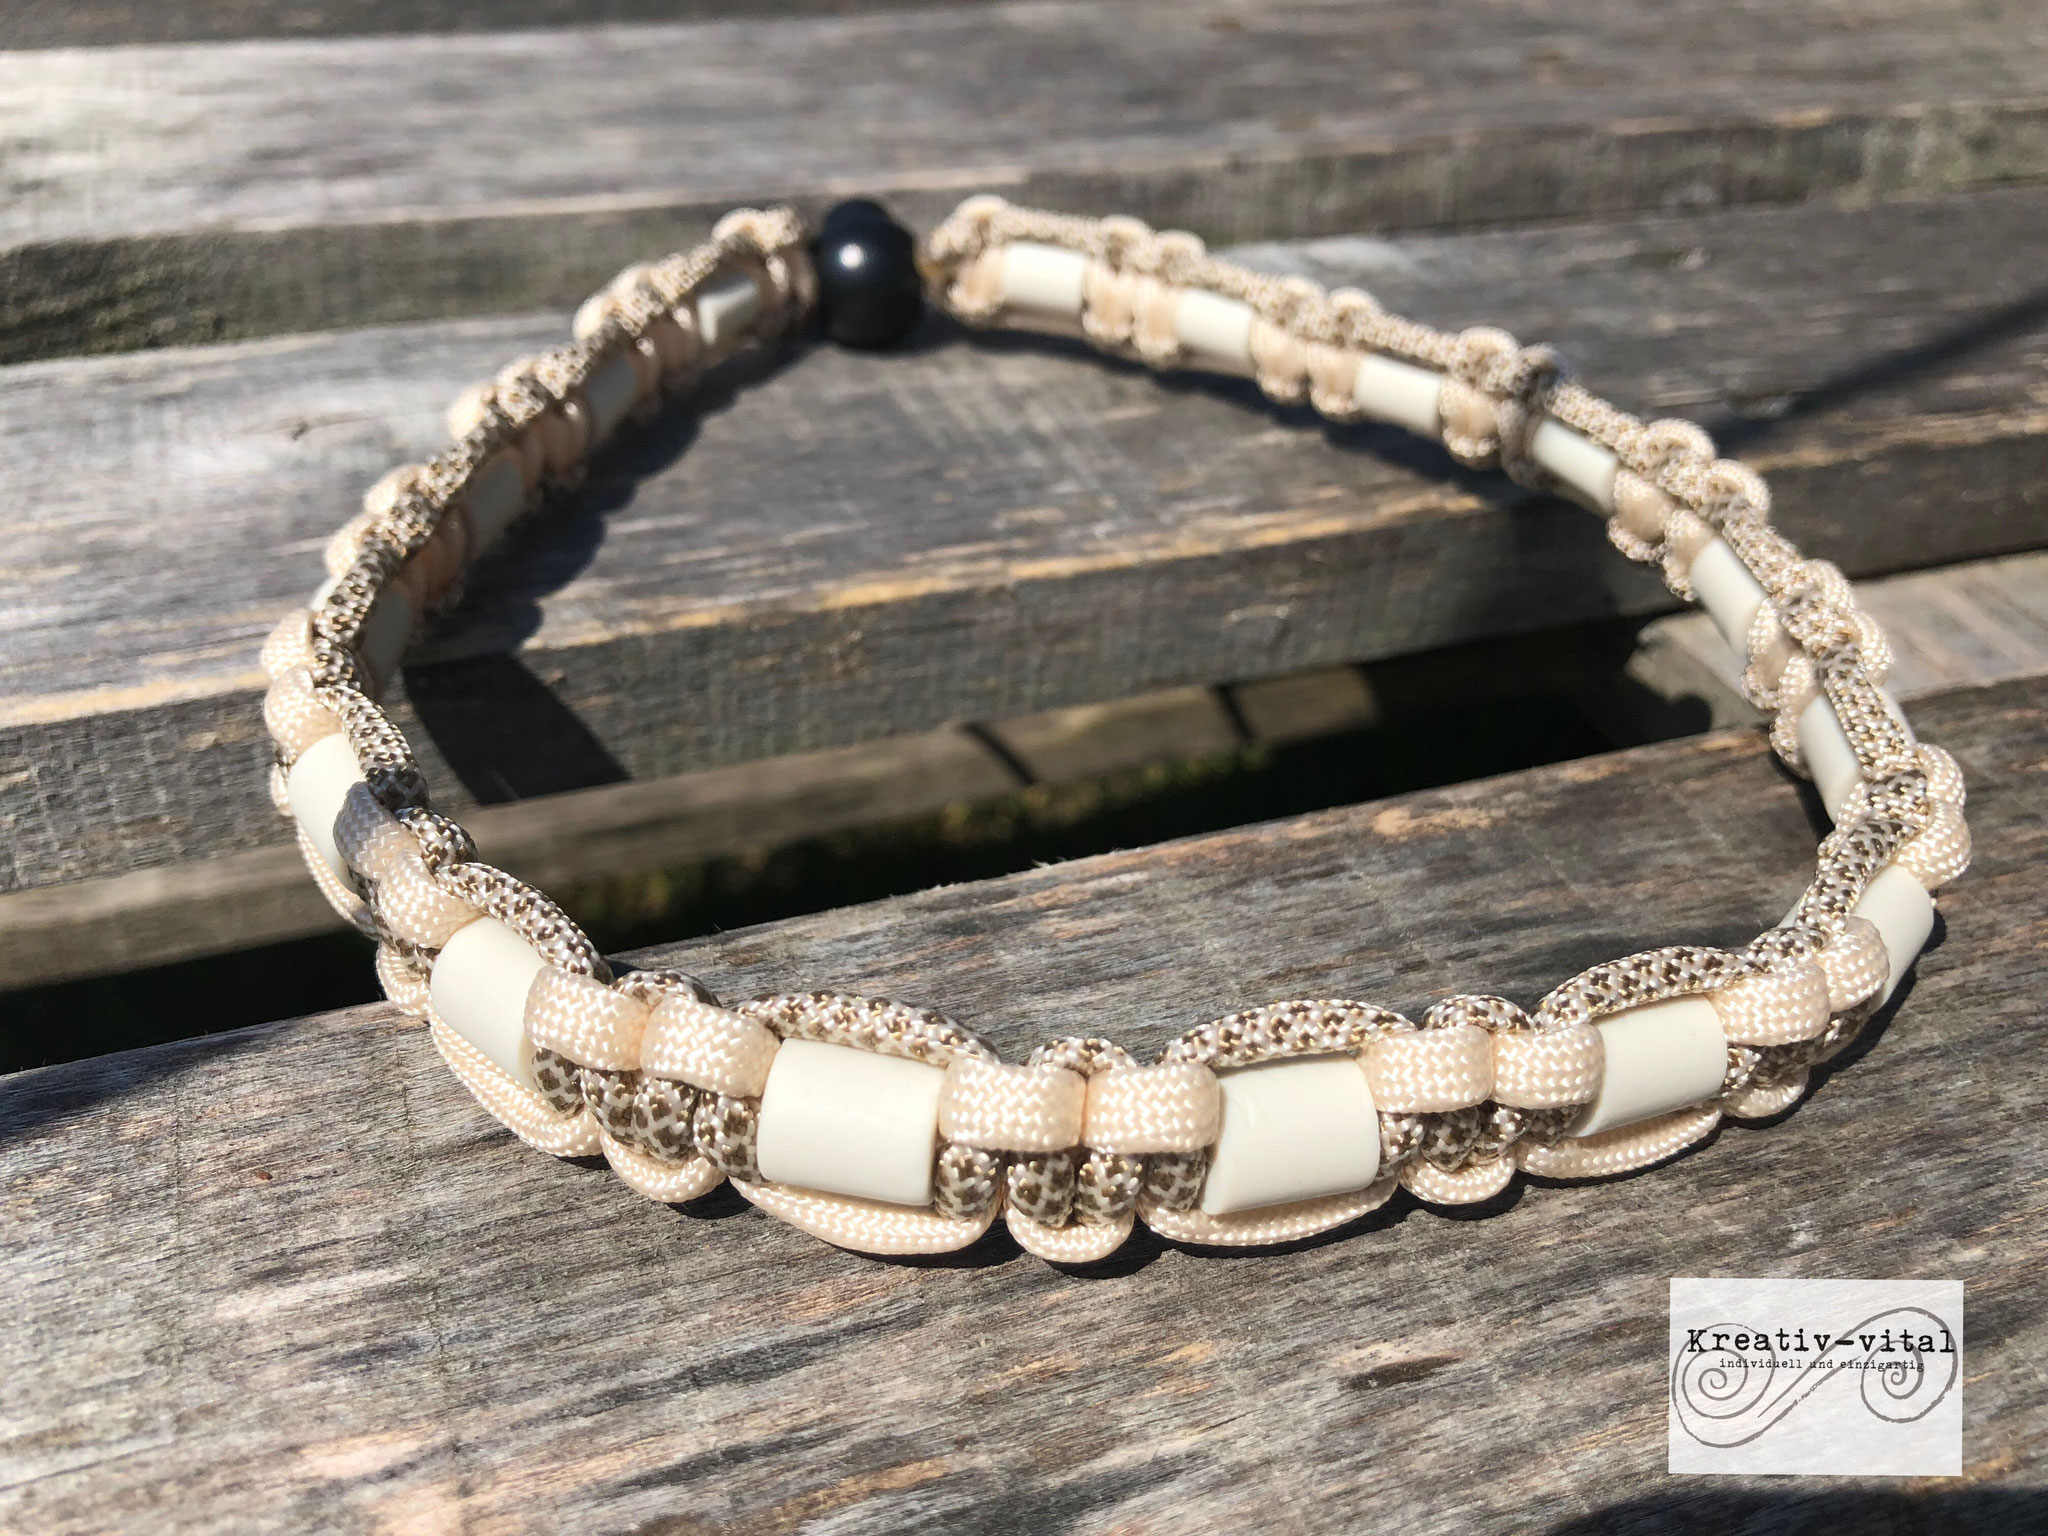 EM Keramik Halsband für Hund/Katze 46-50cm Halsumfang cream/goldbraun